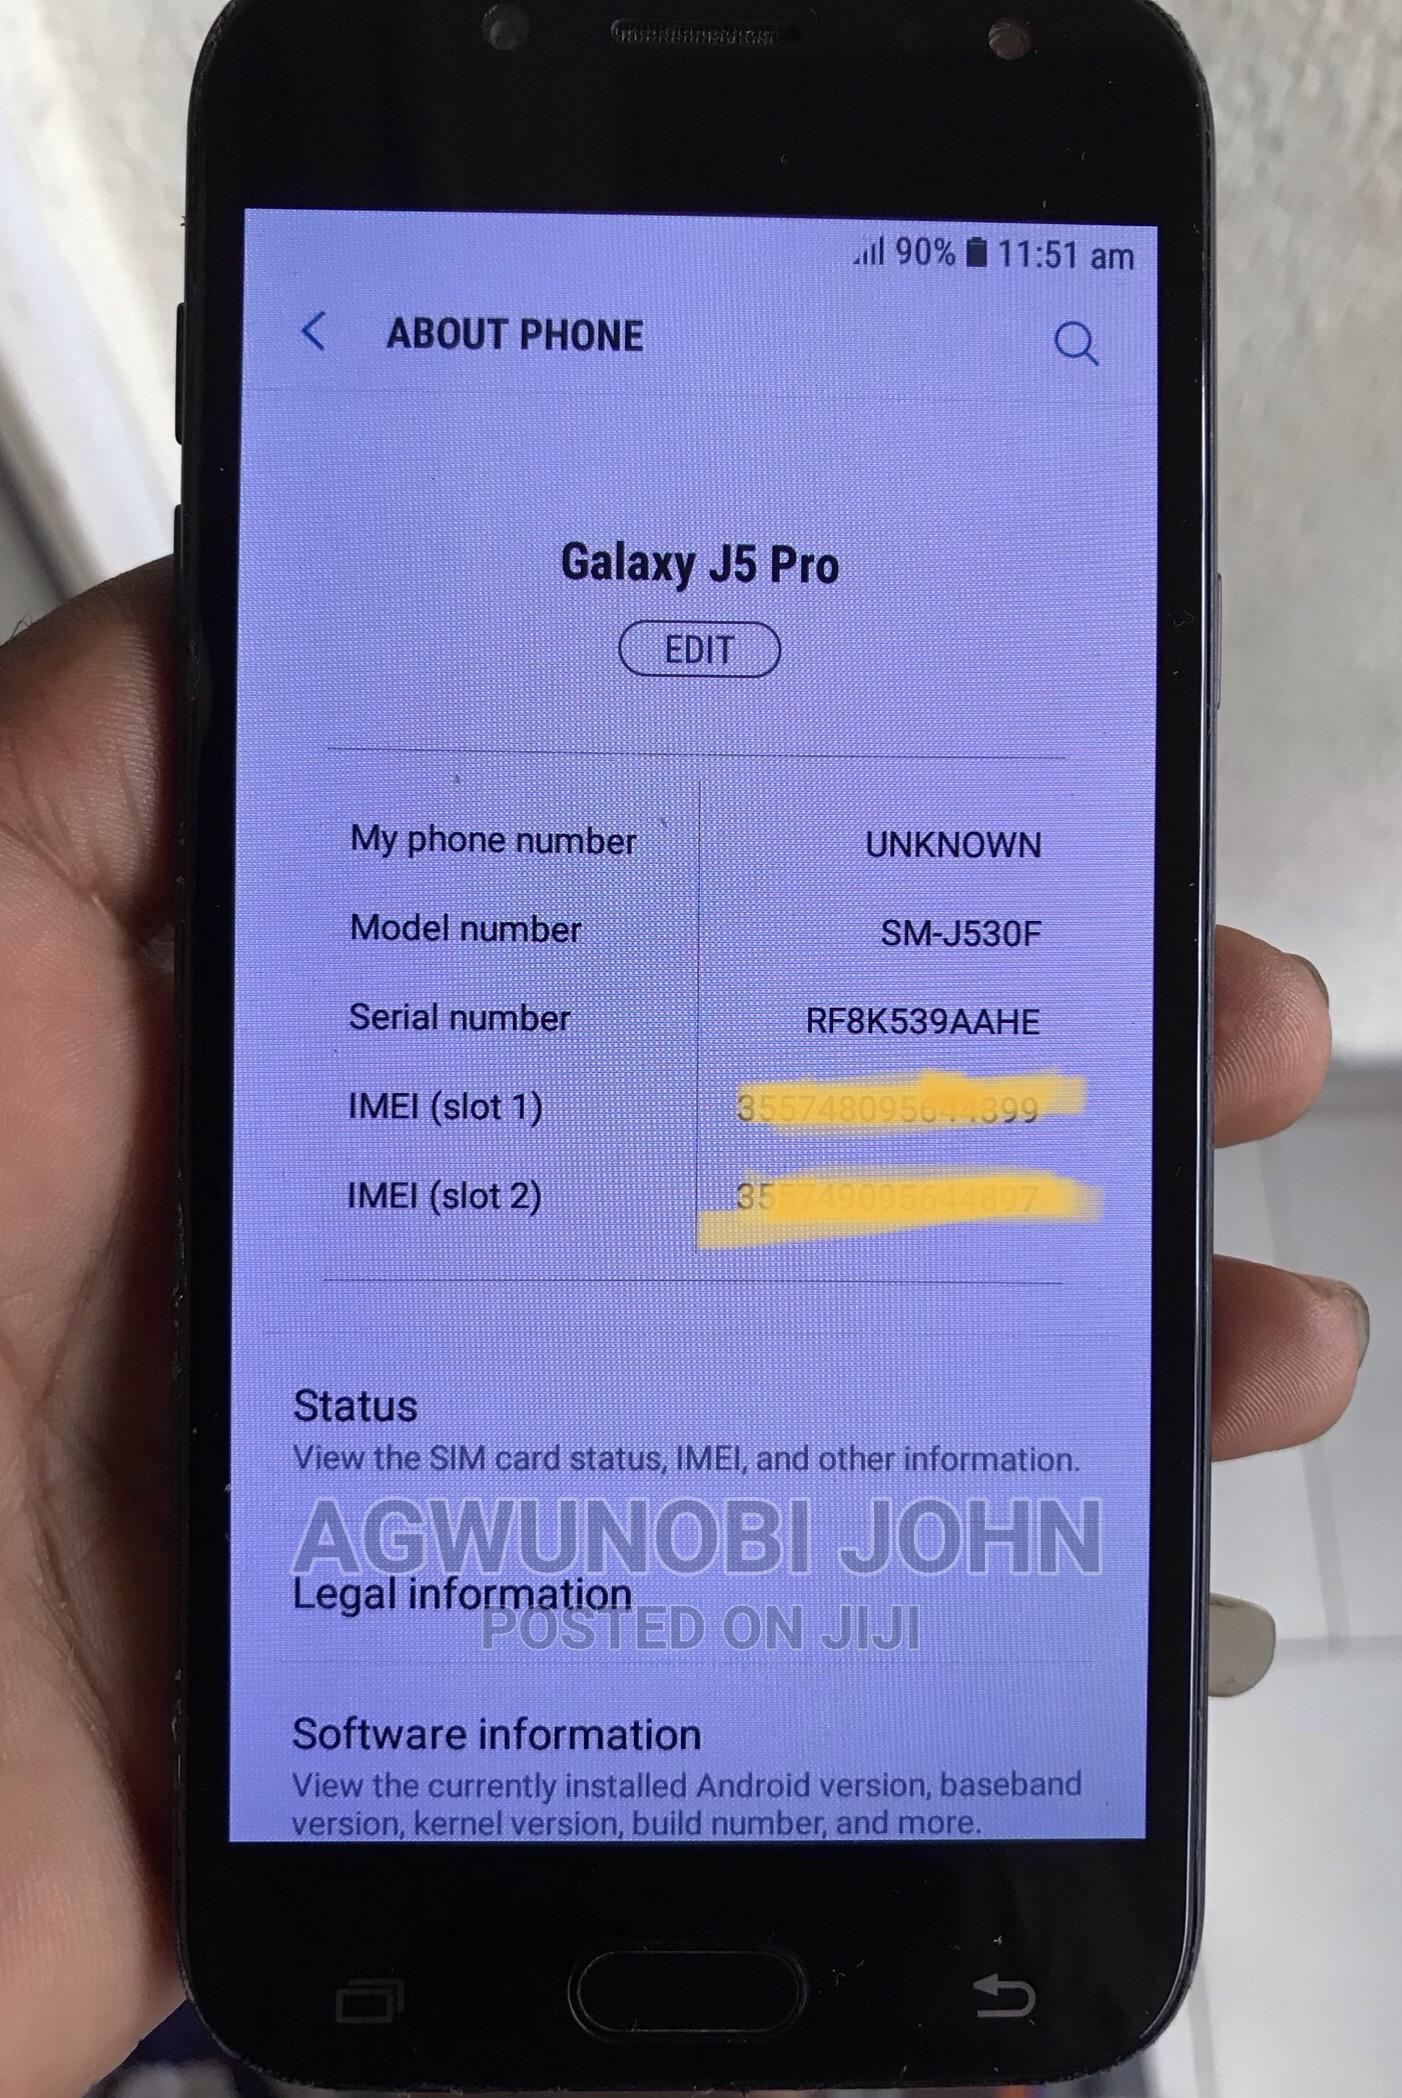 Samsung Galaxy J5 Pro 16 GB Black | Mobile Phones for sale in Obio-Akpor, Rivers State, Nigeria